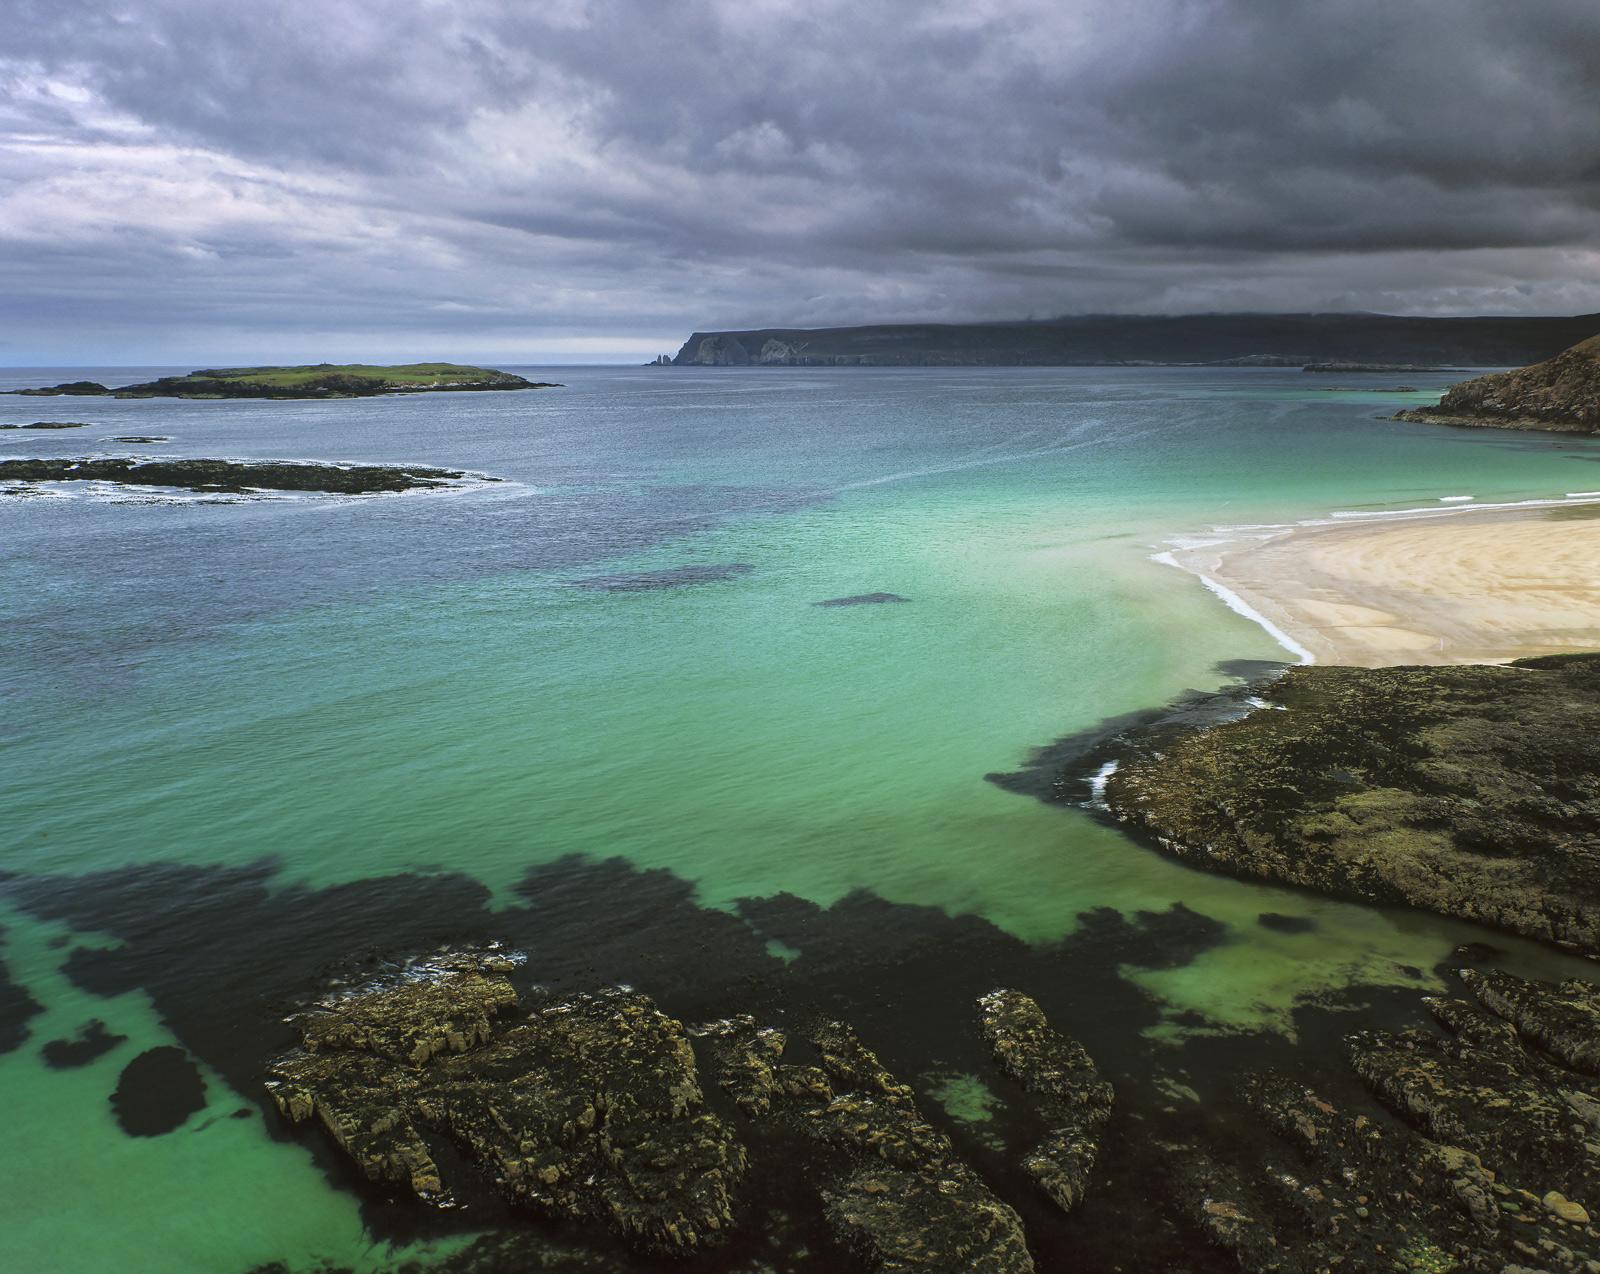 Jade lagoon Sutherland, Little Sango Bay, Sutherland, Scotland, tides, reflected, colour, luminosity, epic, sandy beach , photo